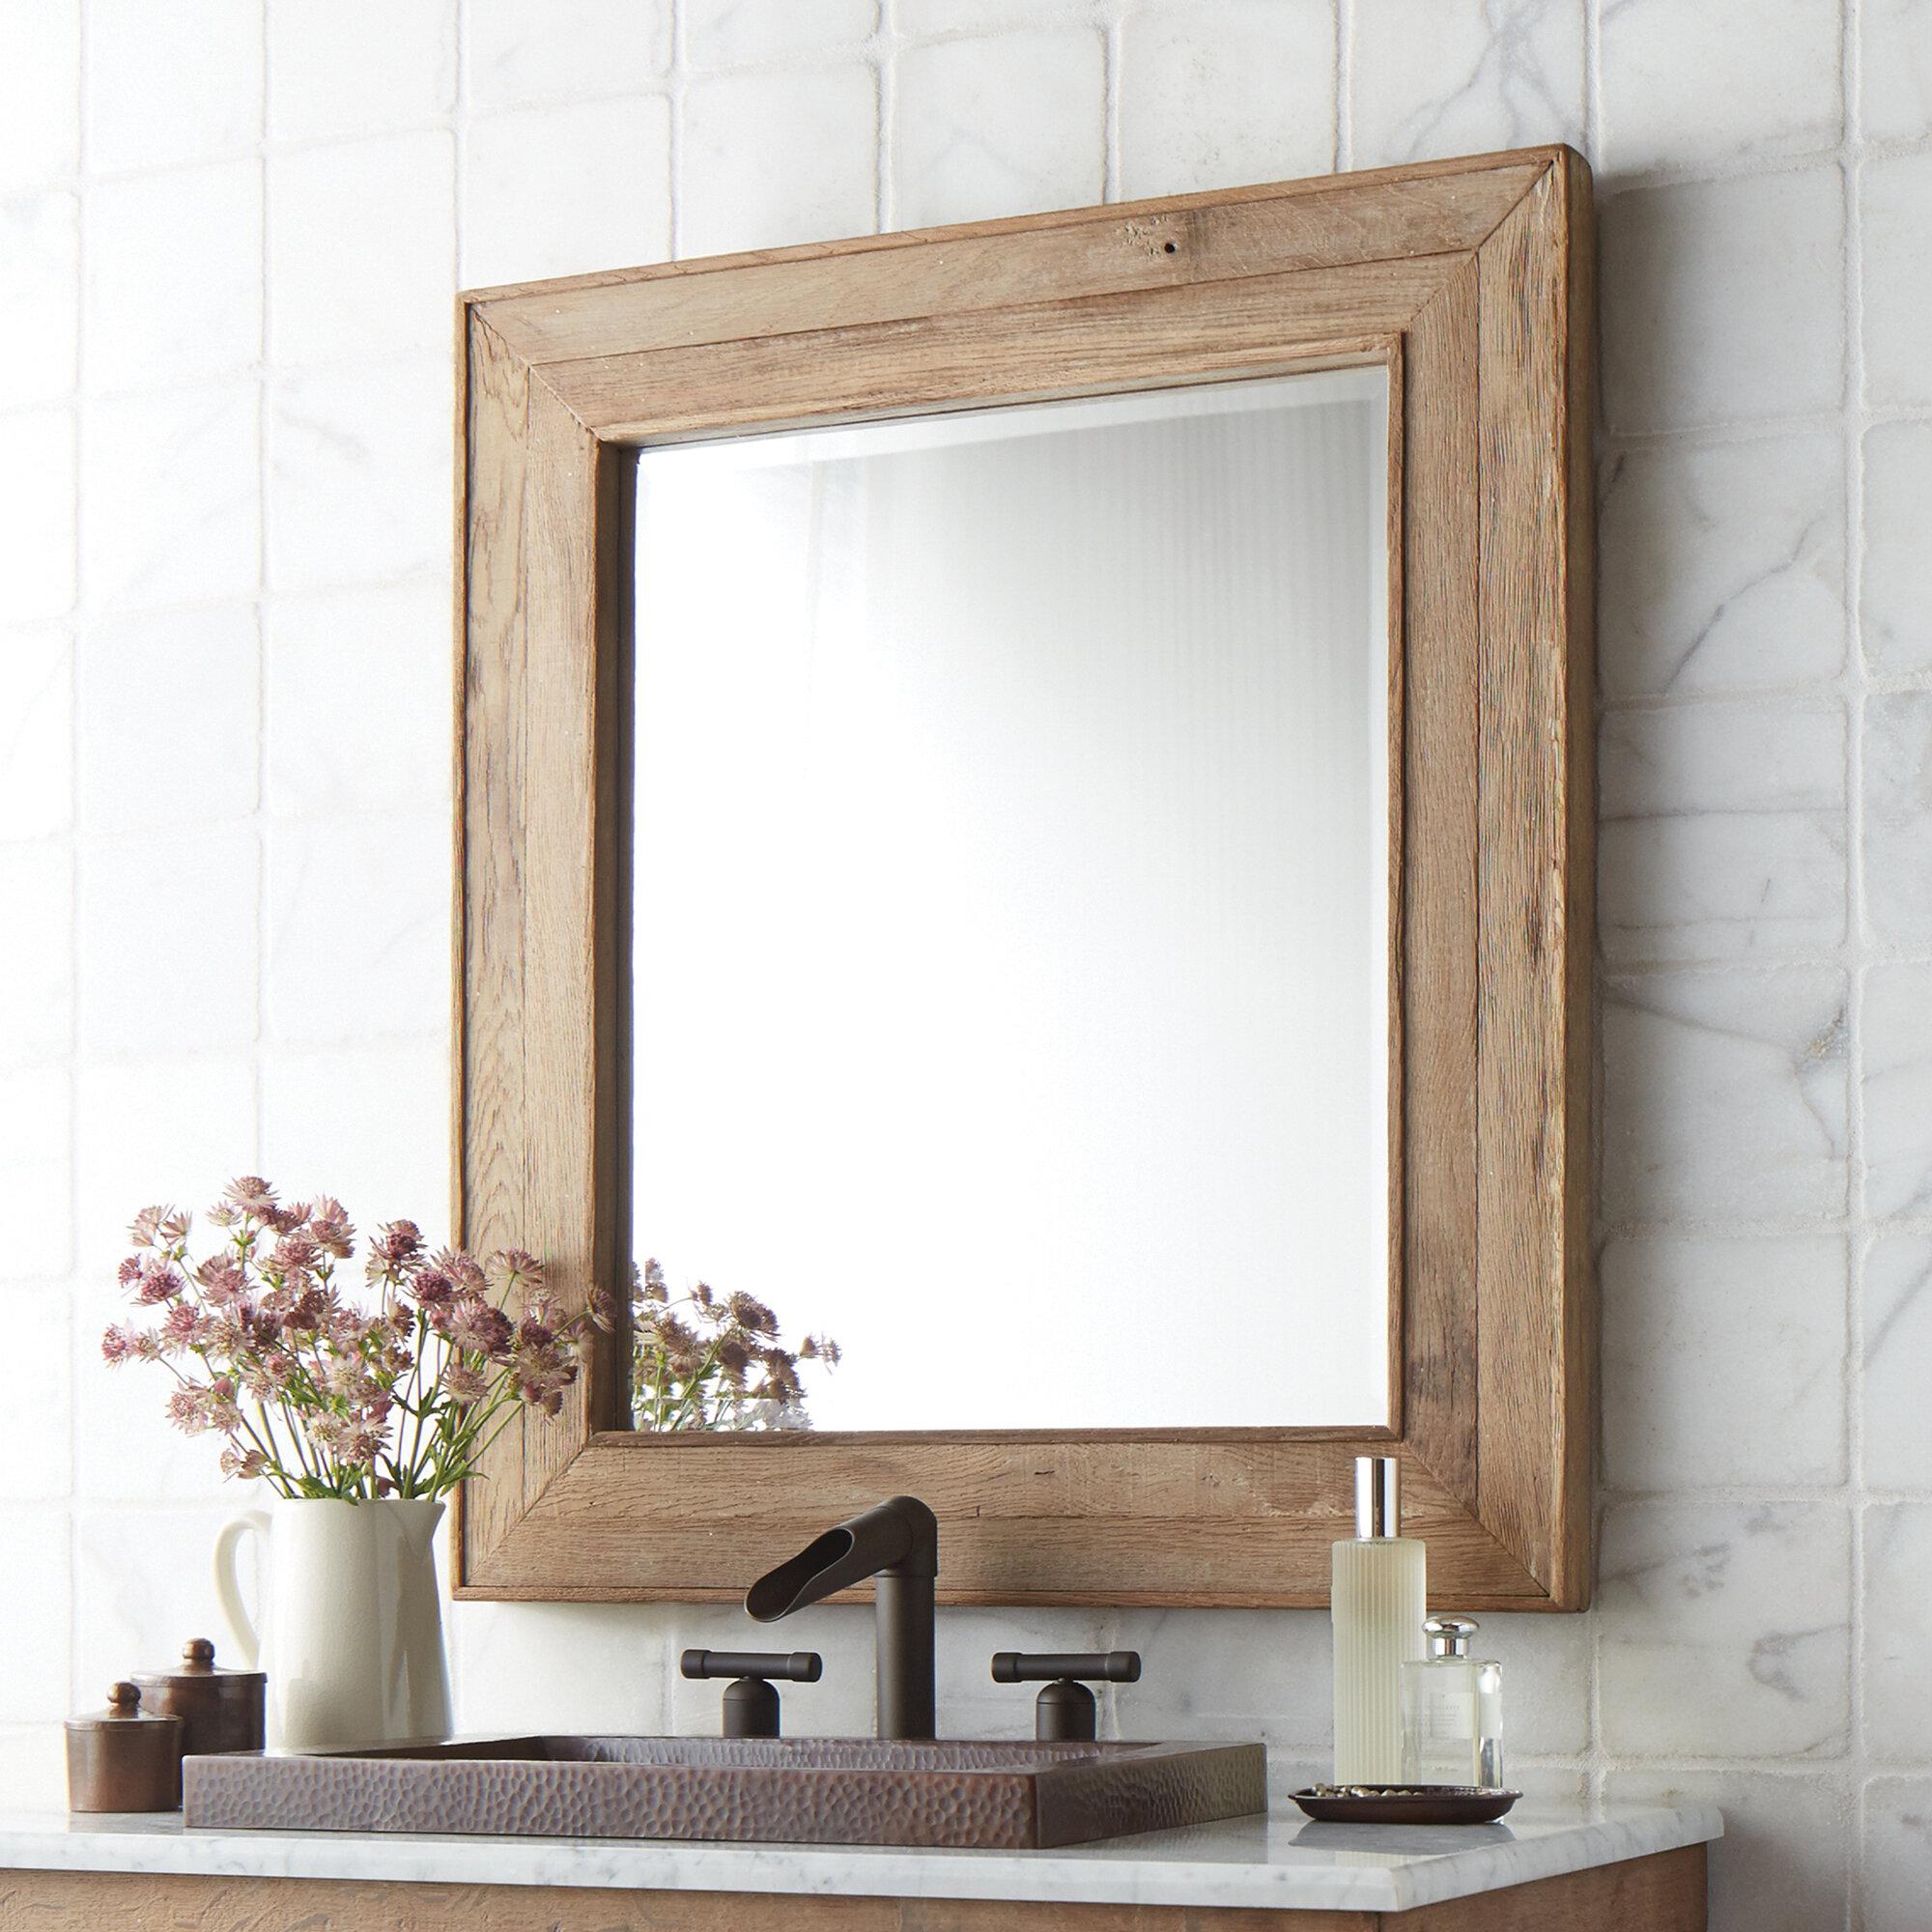 Native Trails Vintner S Chardonnay Rustic Beveled Bathroom Mirror Reviews Wayfair